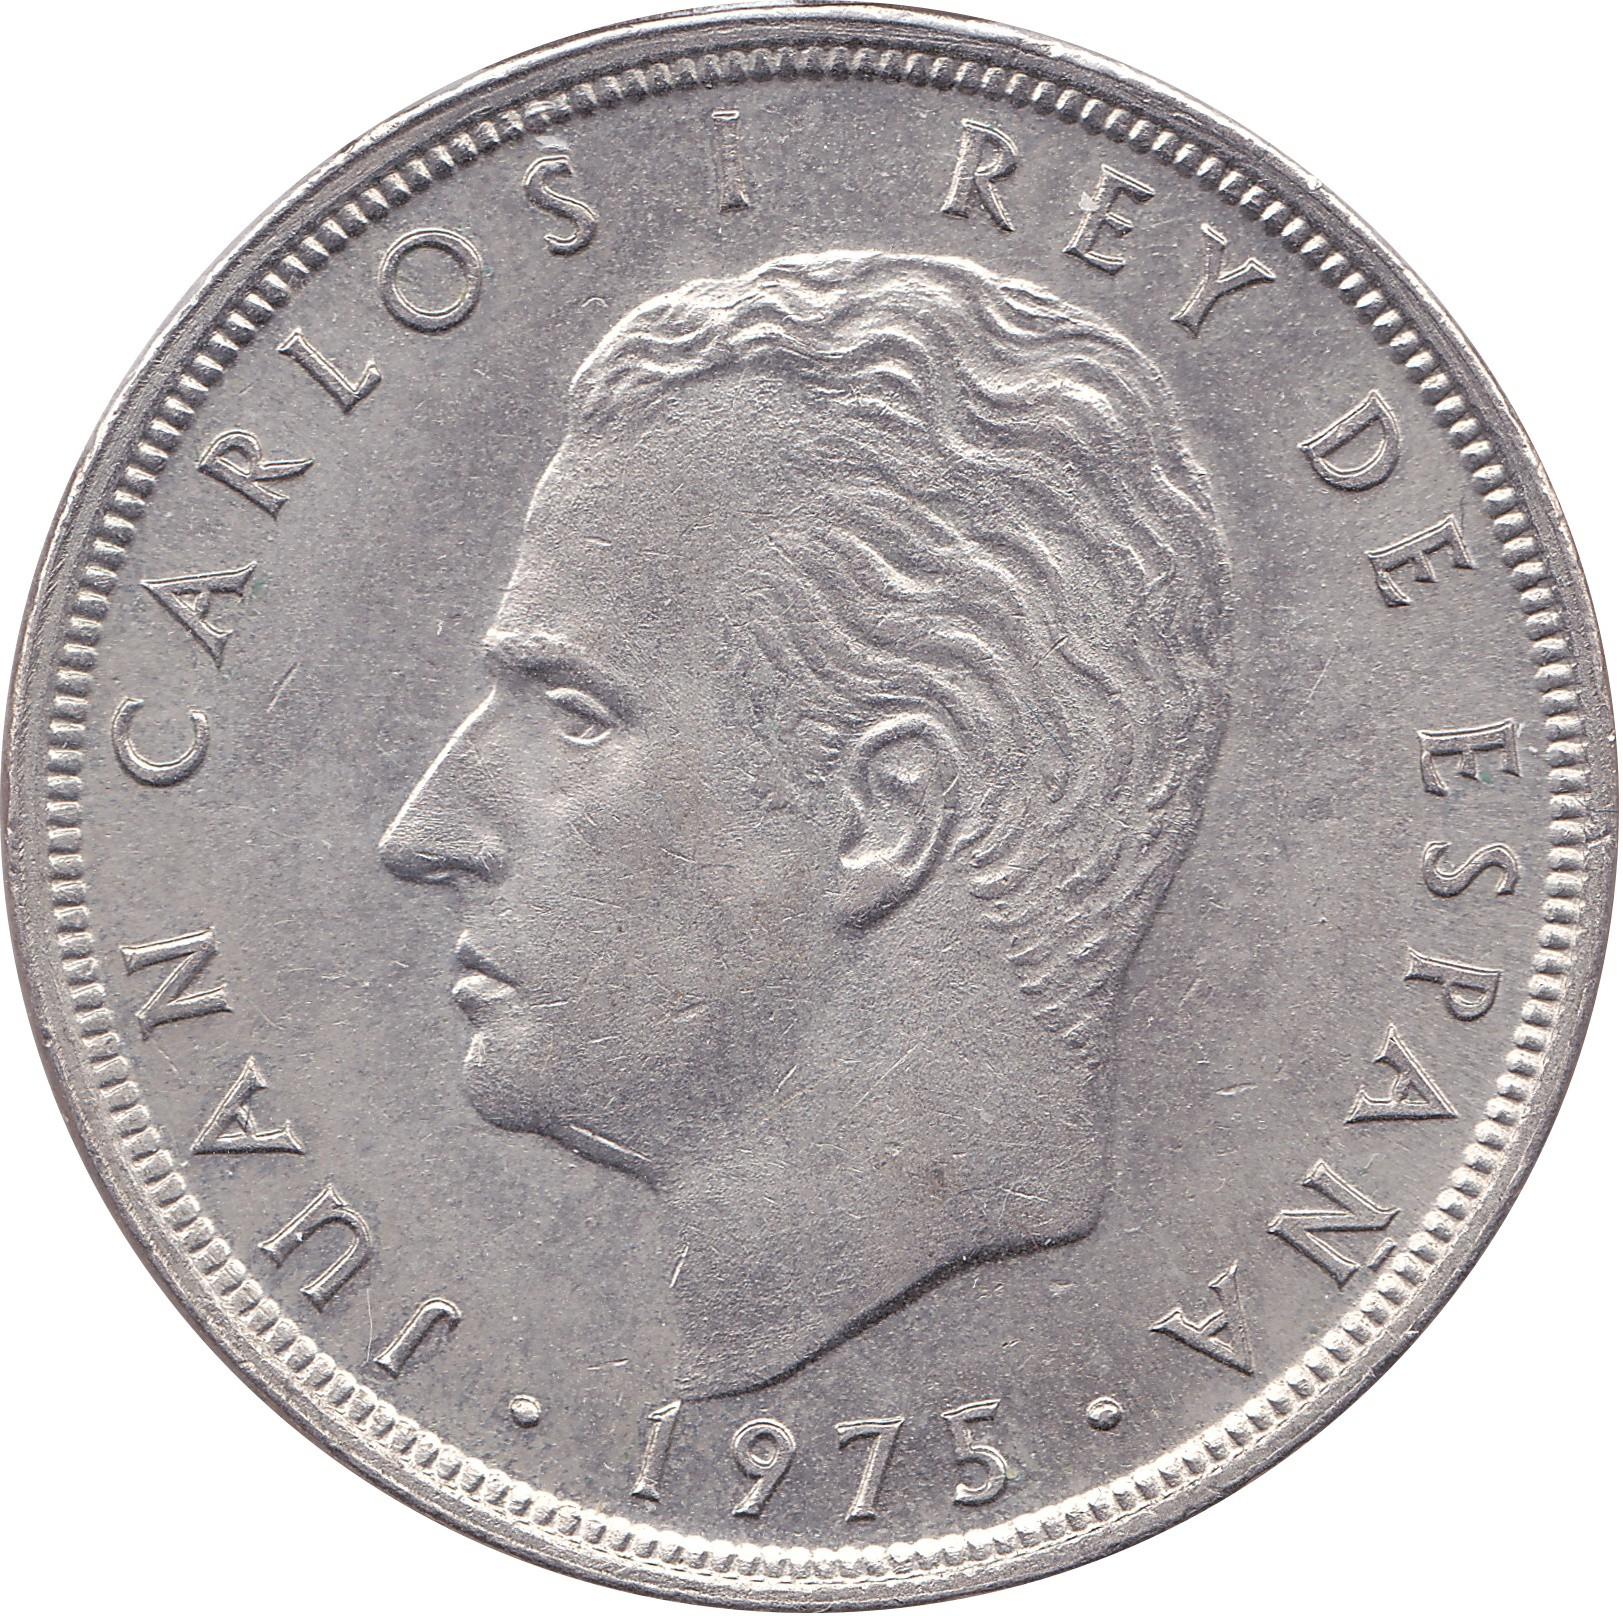 Spain 100 Pesetas (1975)